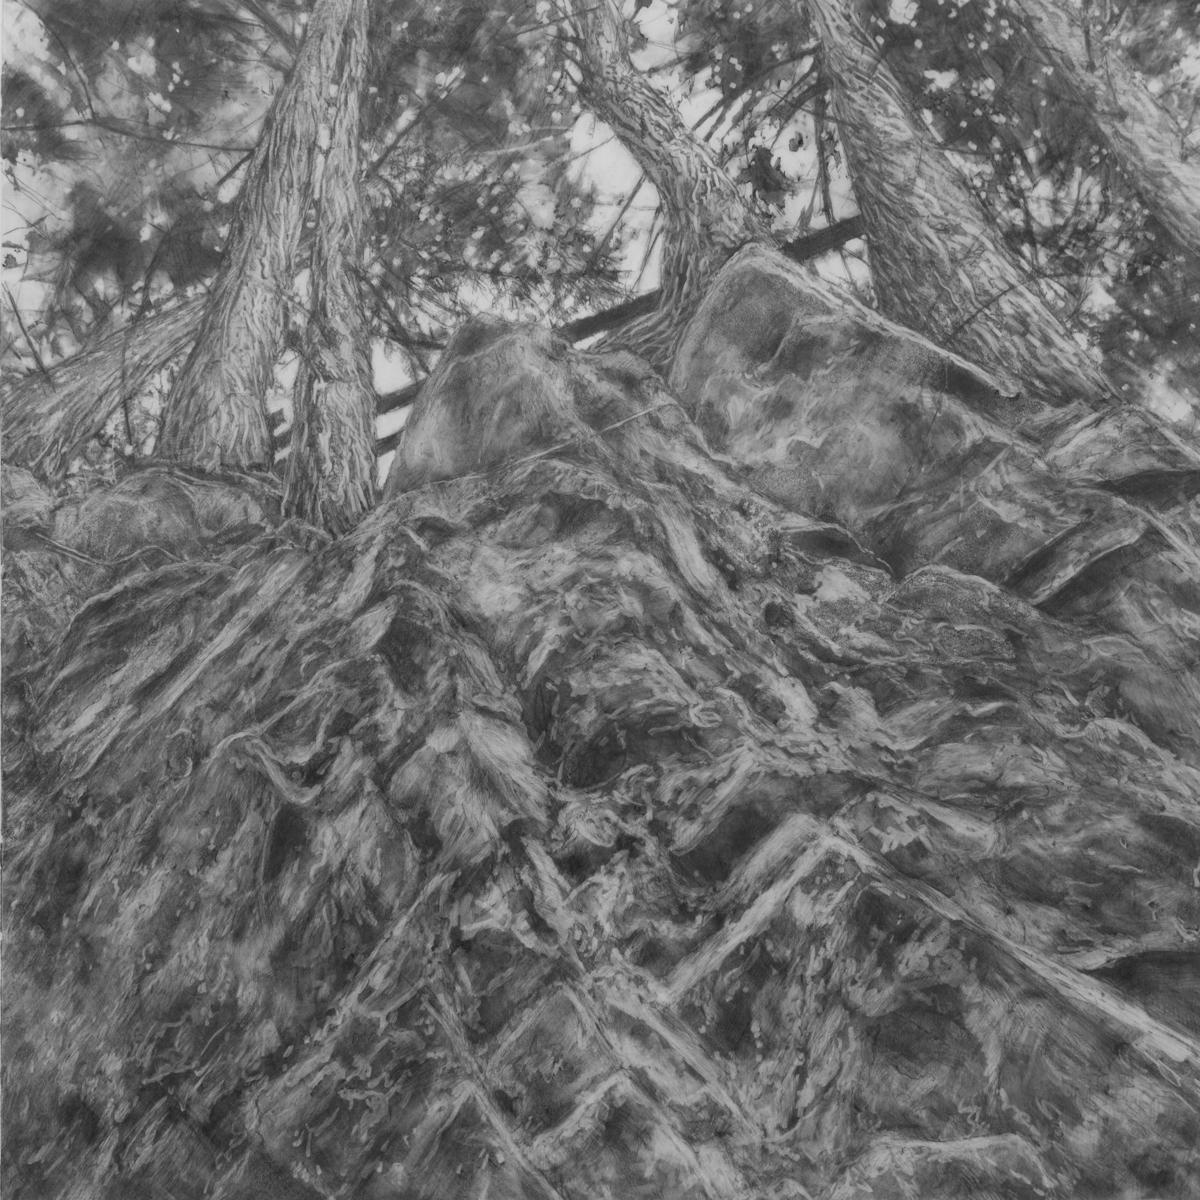 porcupine gorge (large view)